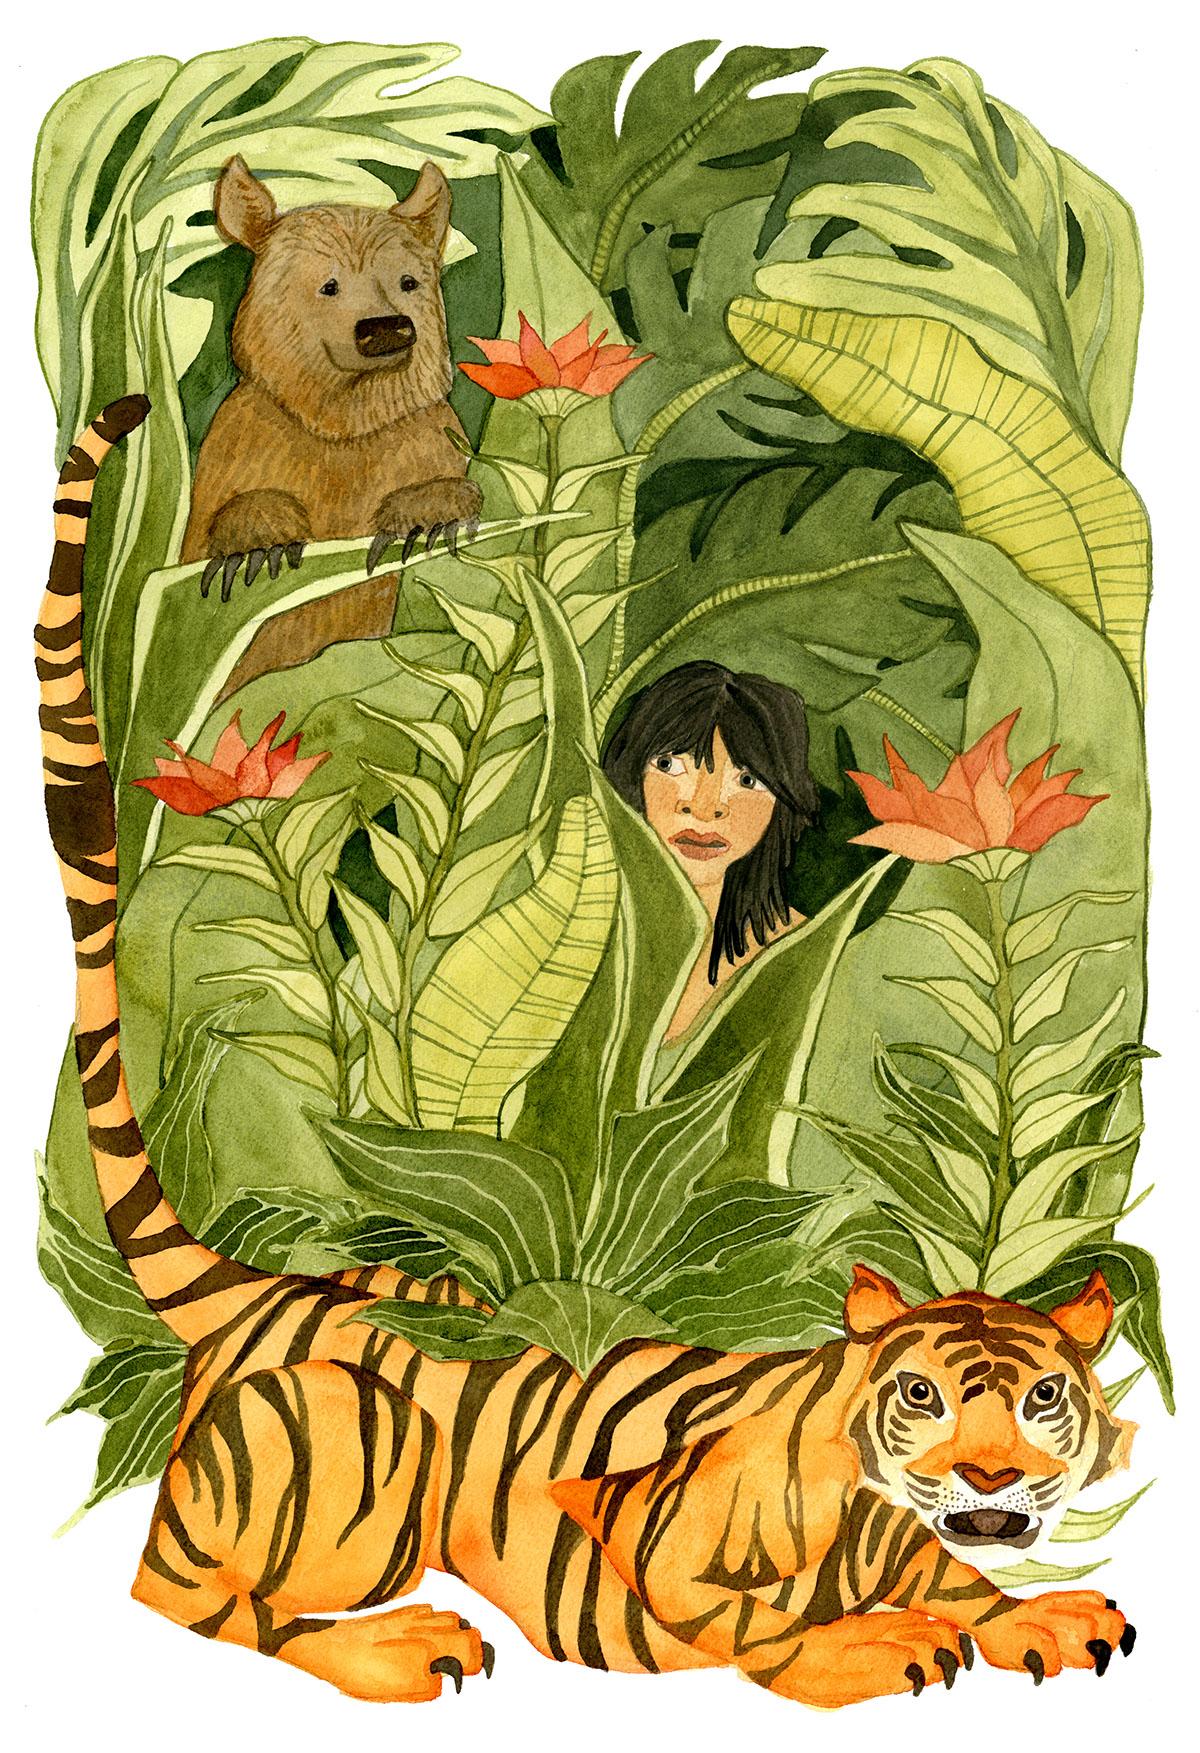 jungle flower mowgli baloo Shere Khan The Jungle Book plants vines banana leaves tiger bear watercolor bromeliad